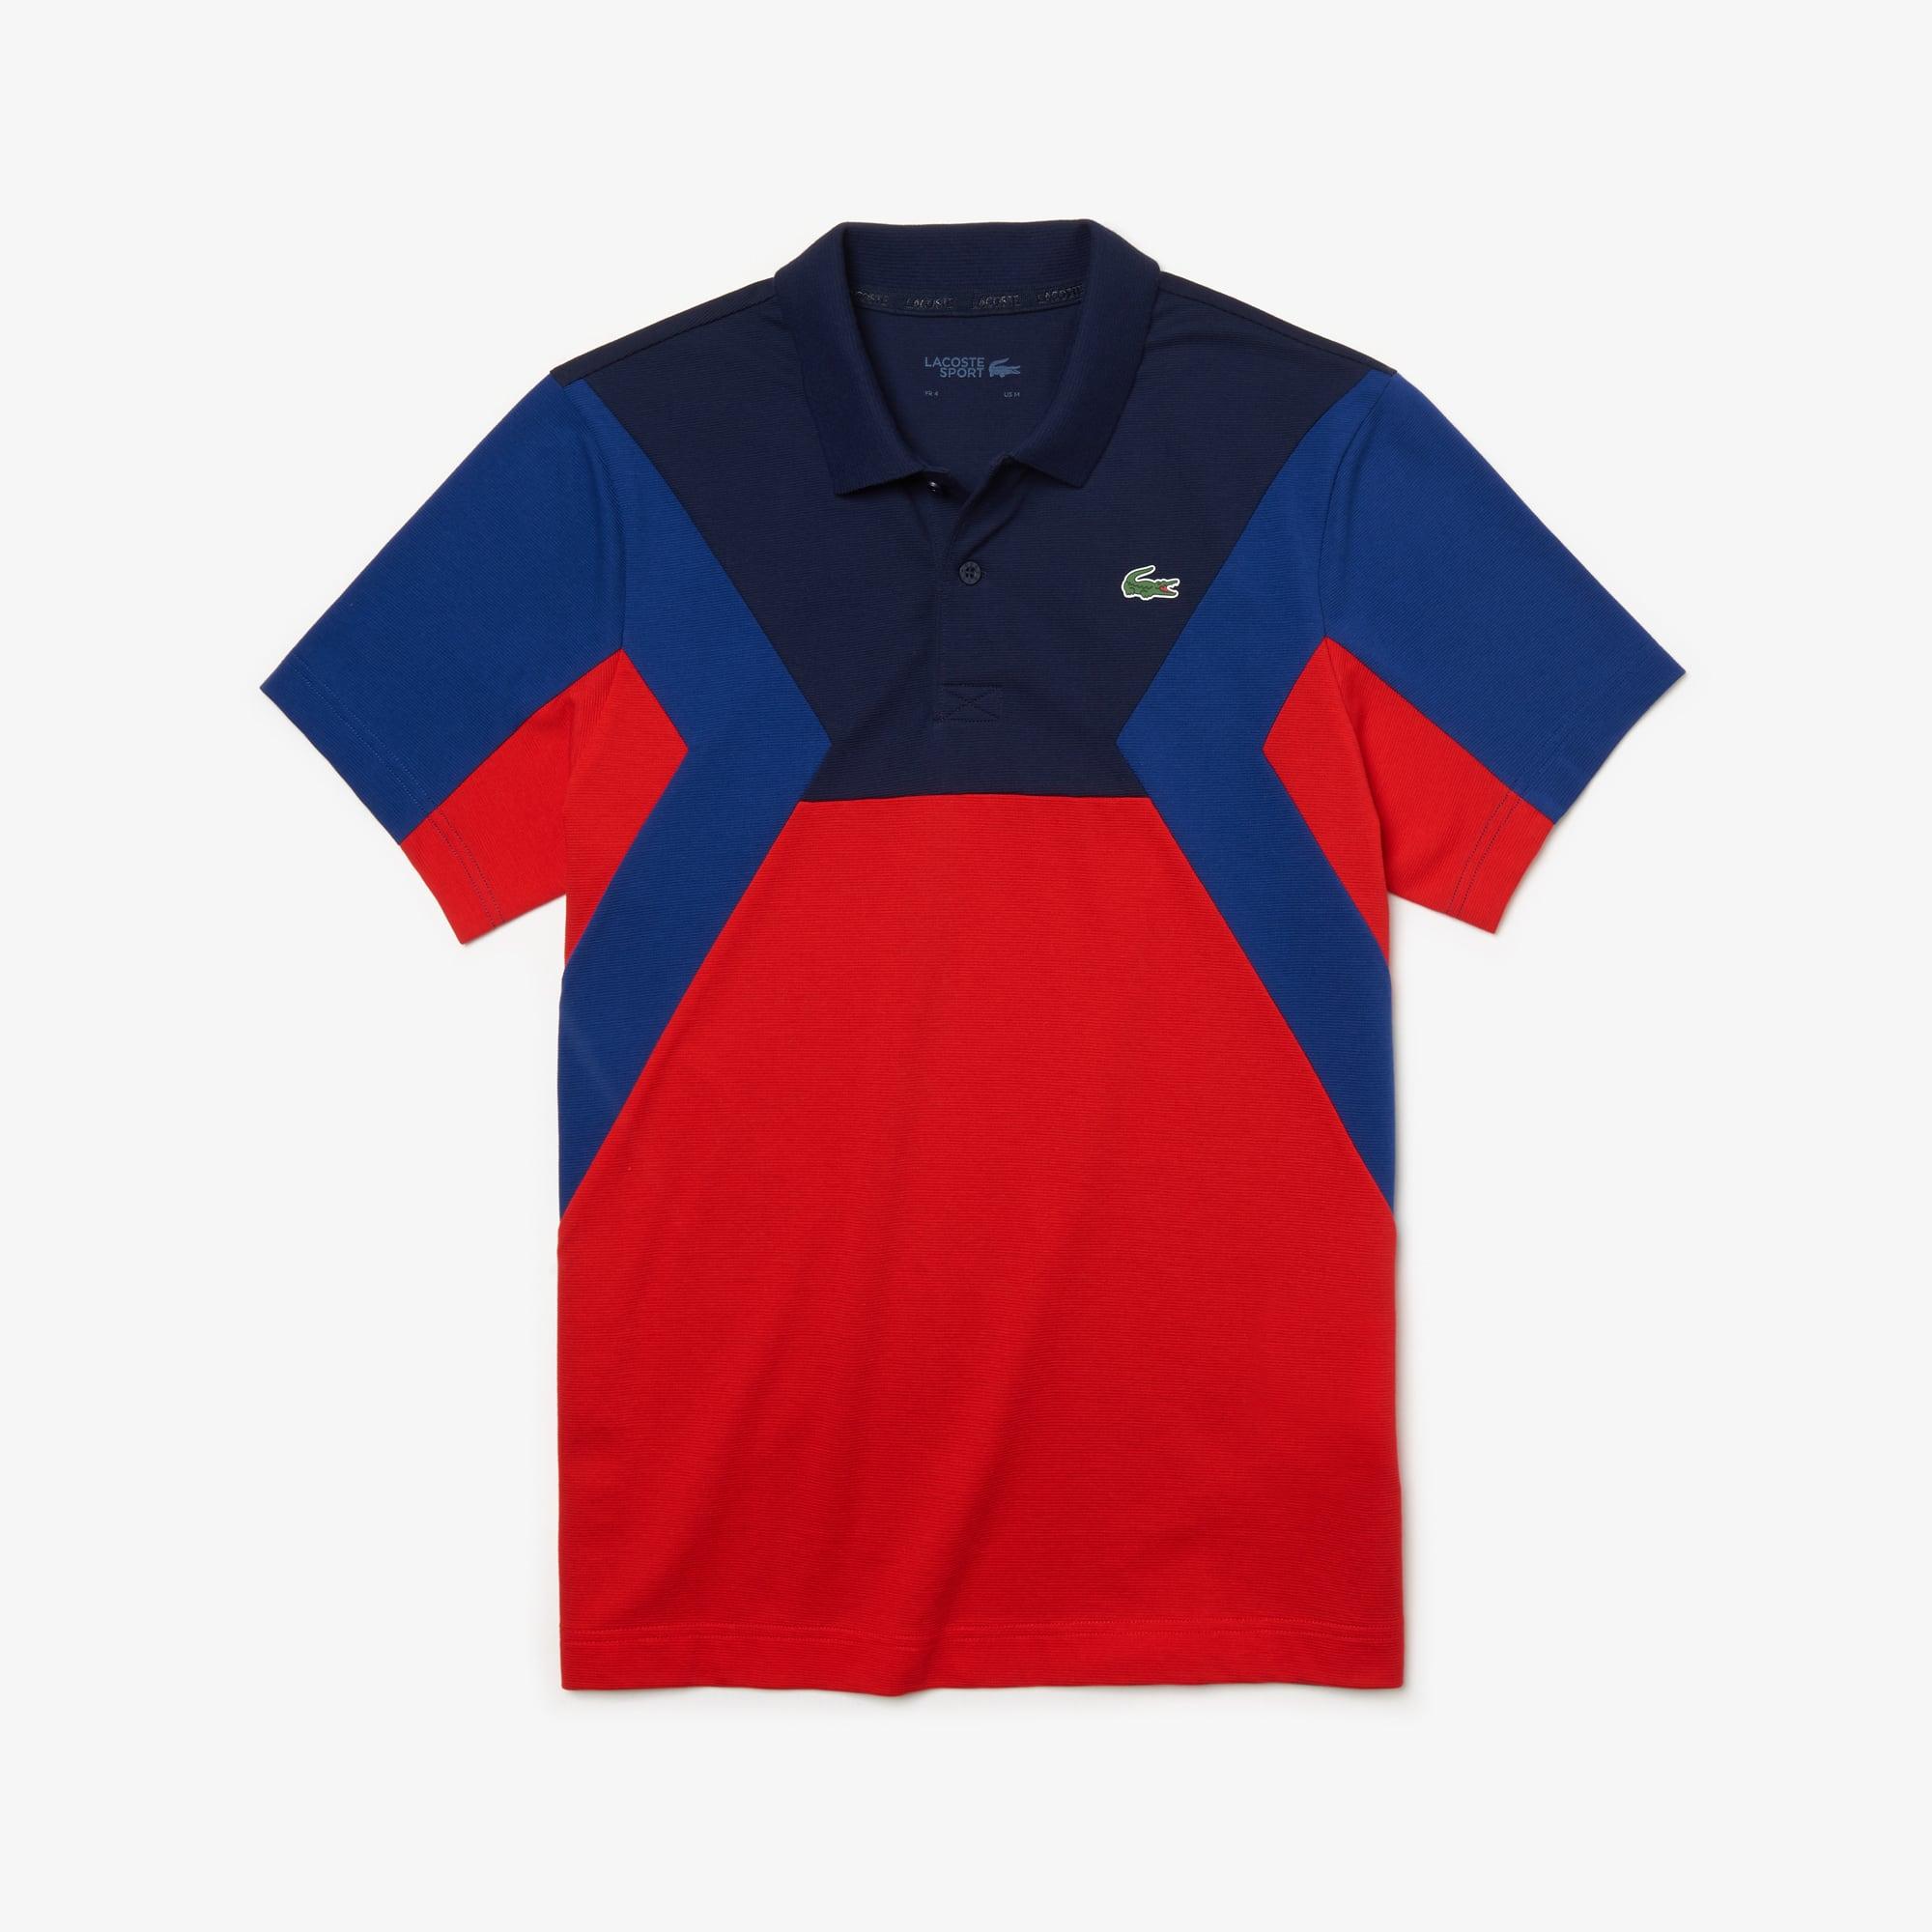 check out fb9de ed9a0 Herren LACOSTE SPORT Ultra-Light-Poloshirt mit Colourblocks ...